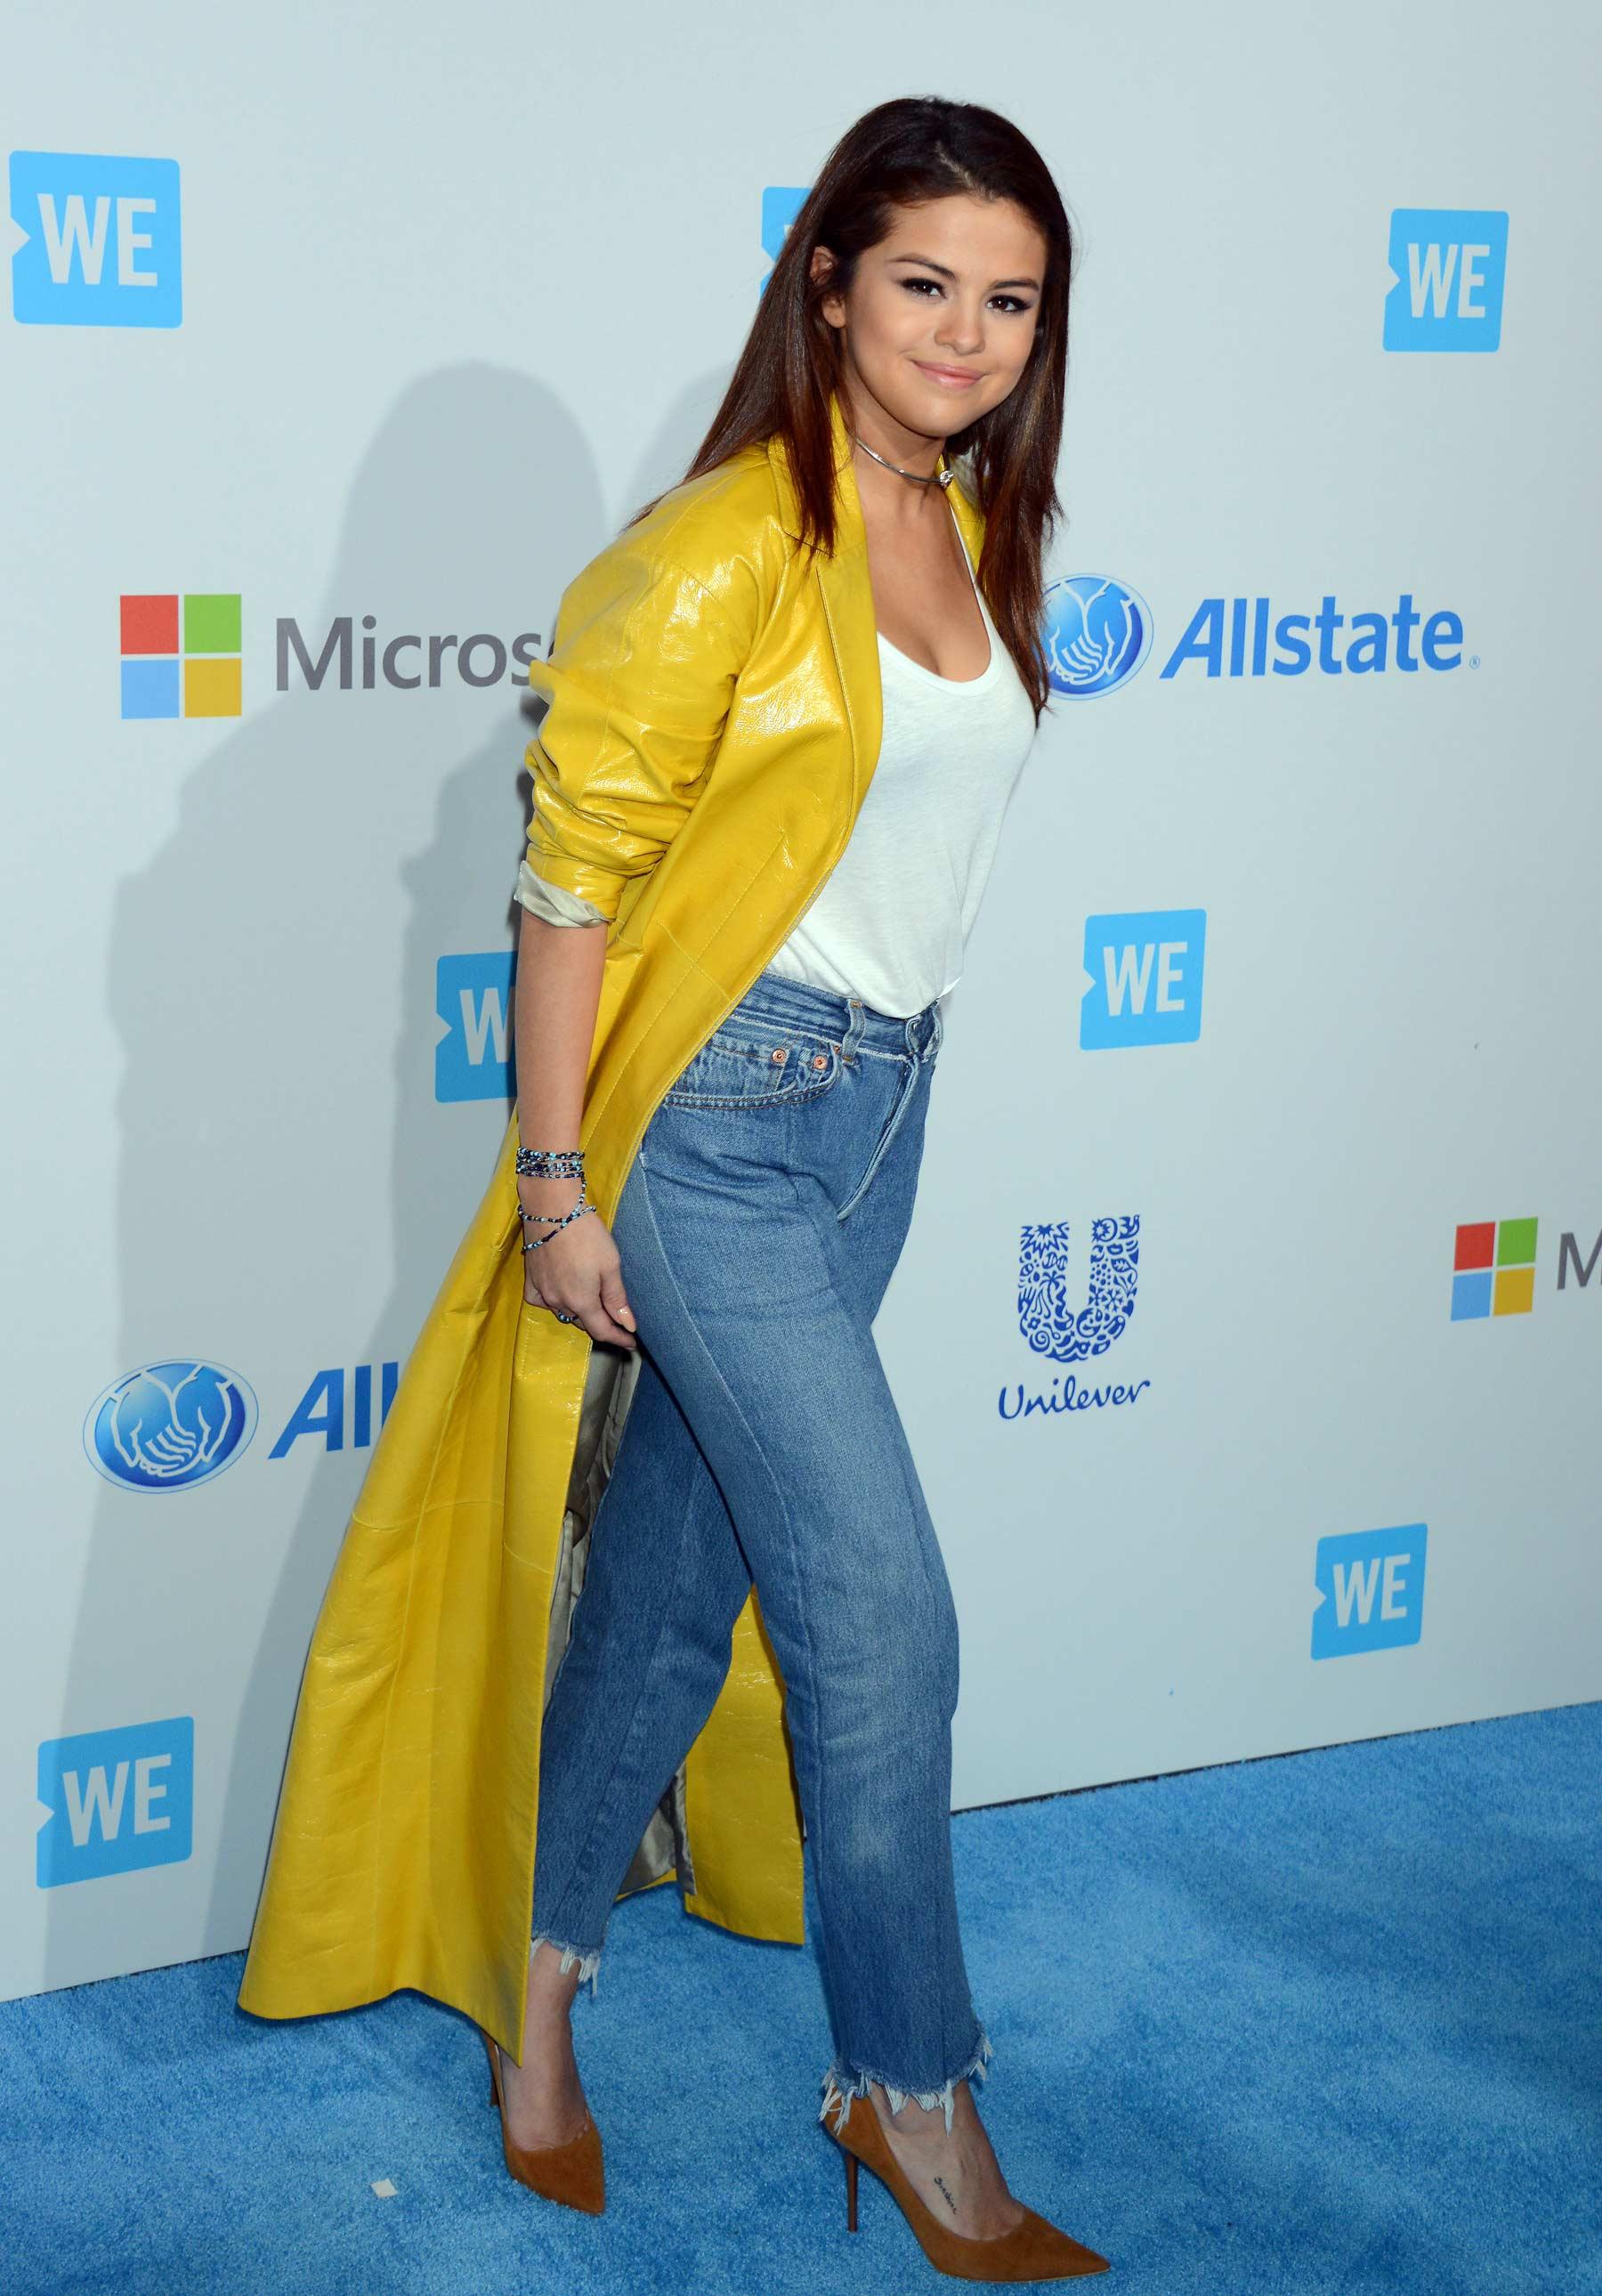 Selena Gomez attends WE Day California 2016